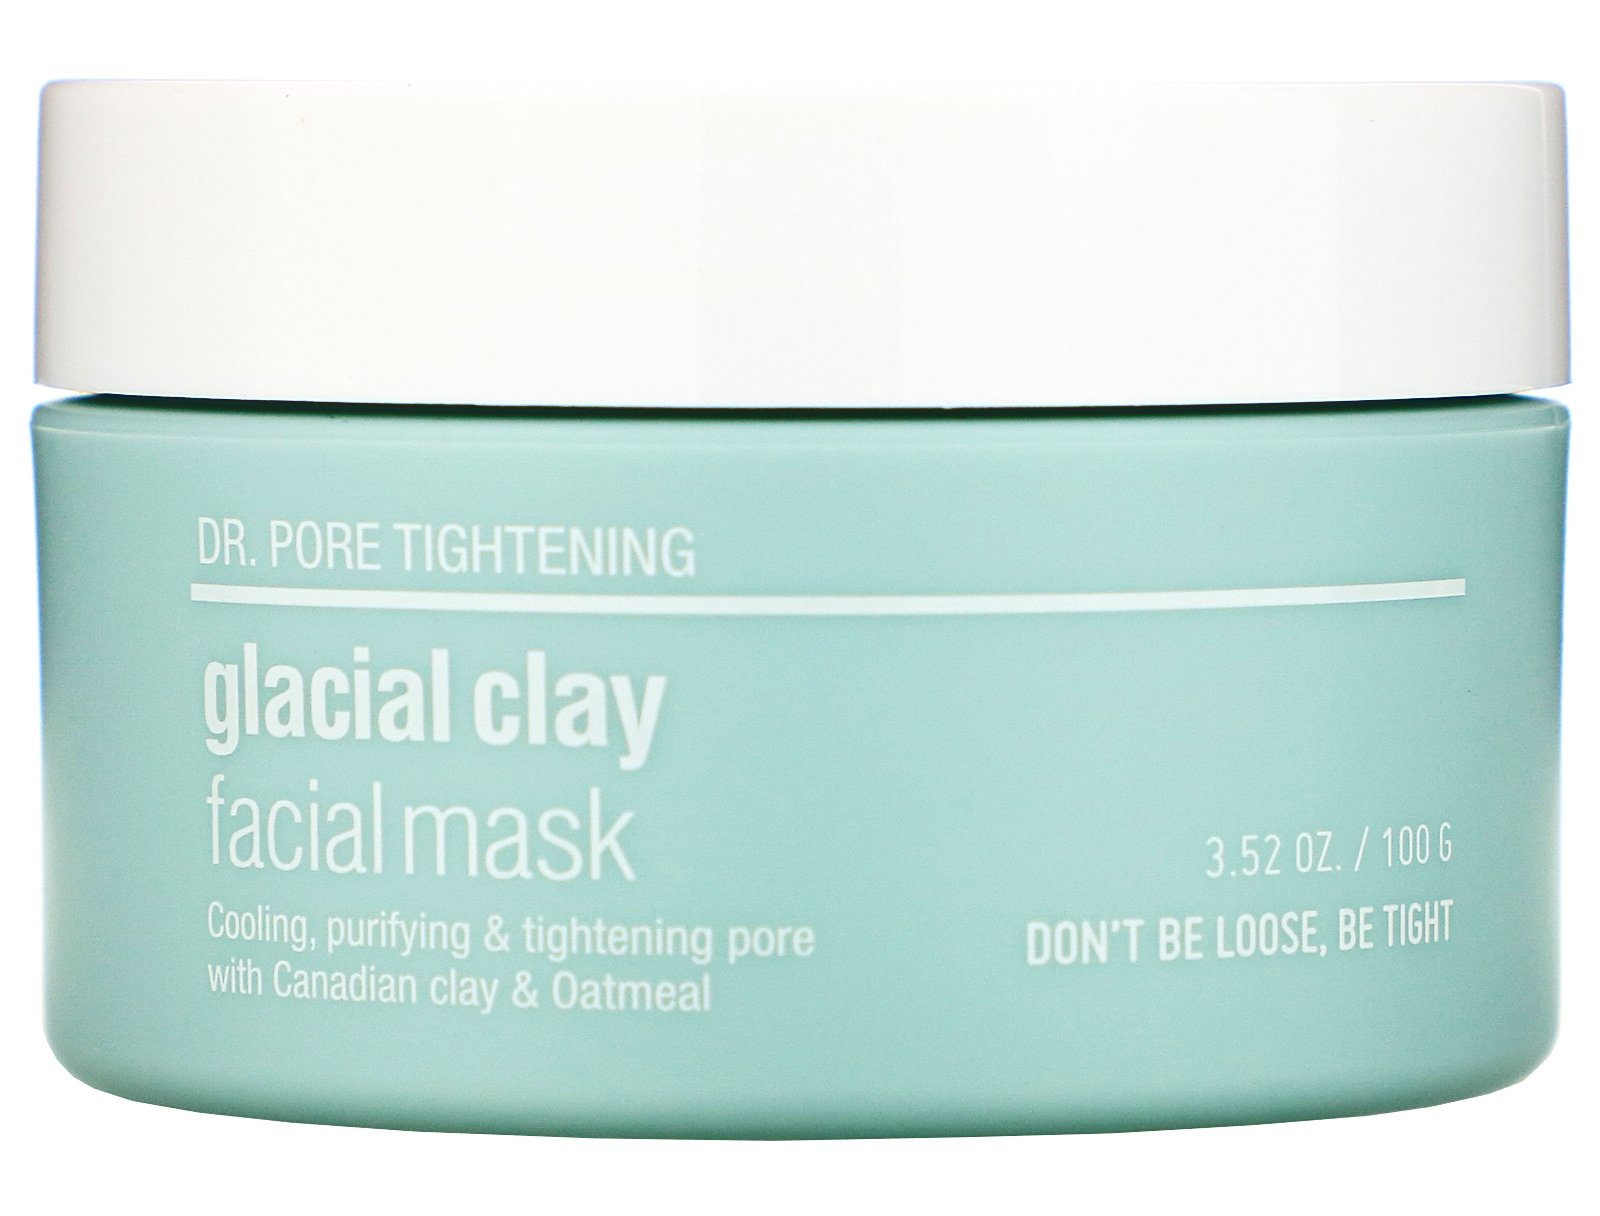 Skin&Lab Dr. Pore Tightening Glacial Clay Facial Mask